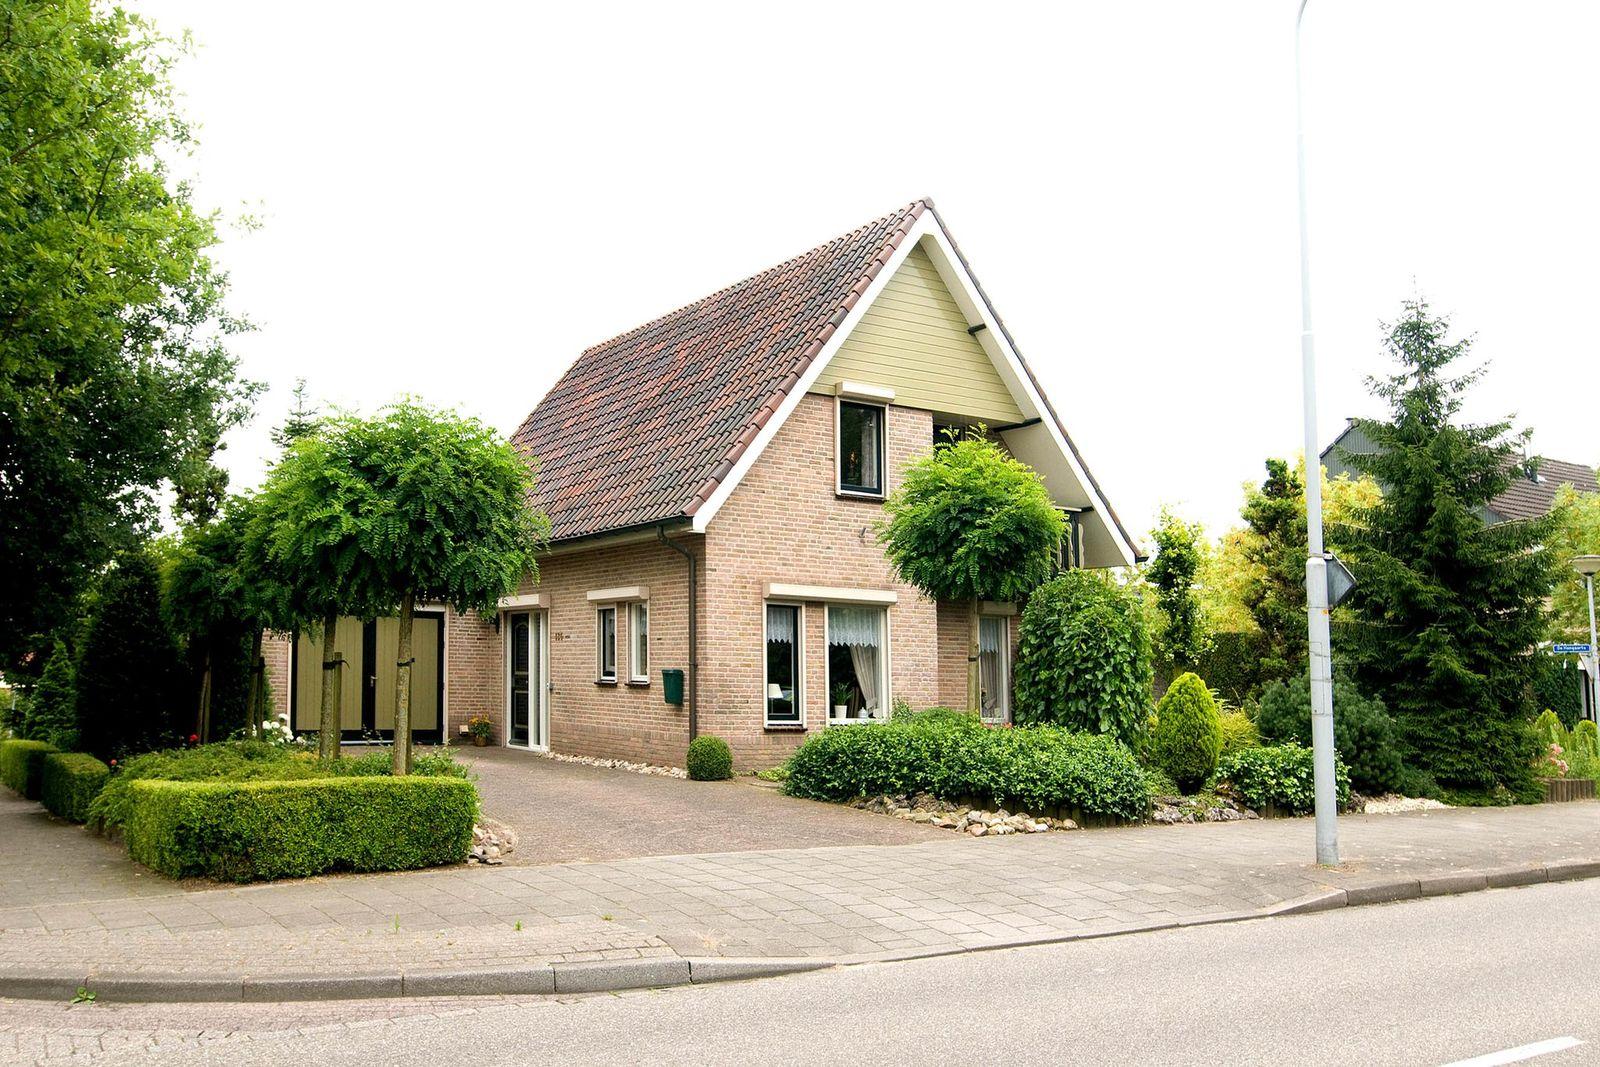 Oude Doetinchemseweg 136, 's-heerenberg